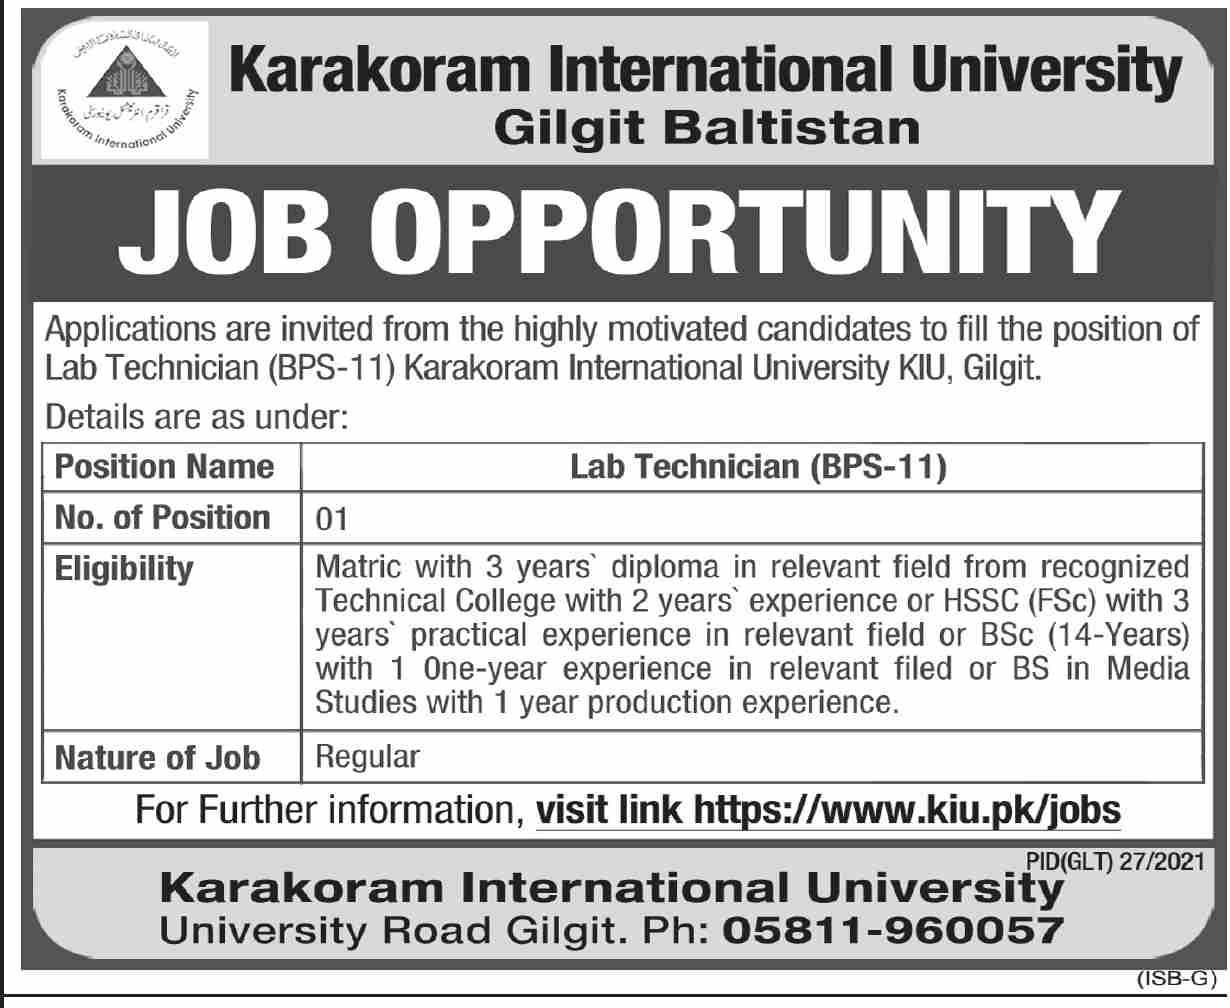 www.kiu.pk Jobs 2021 - Karakoram International University Gilgit Baltistan Jobs 2021 in Pakistan